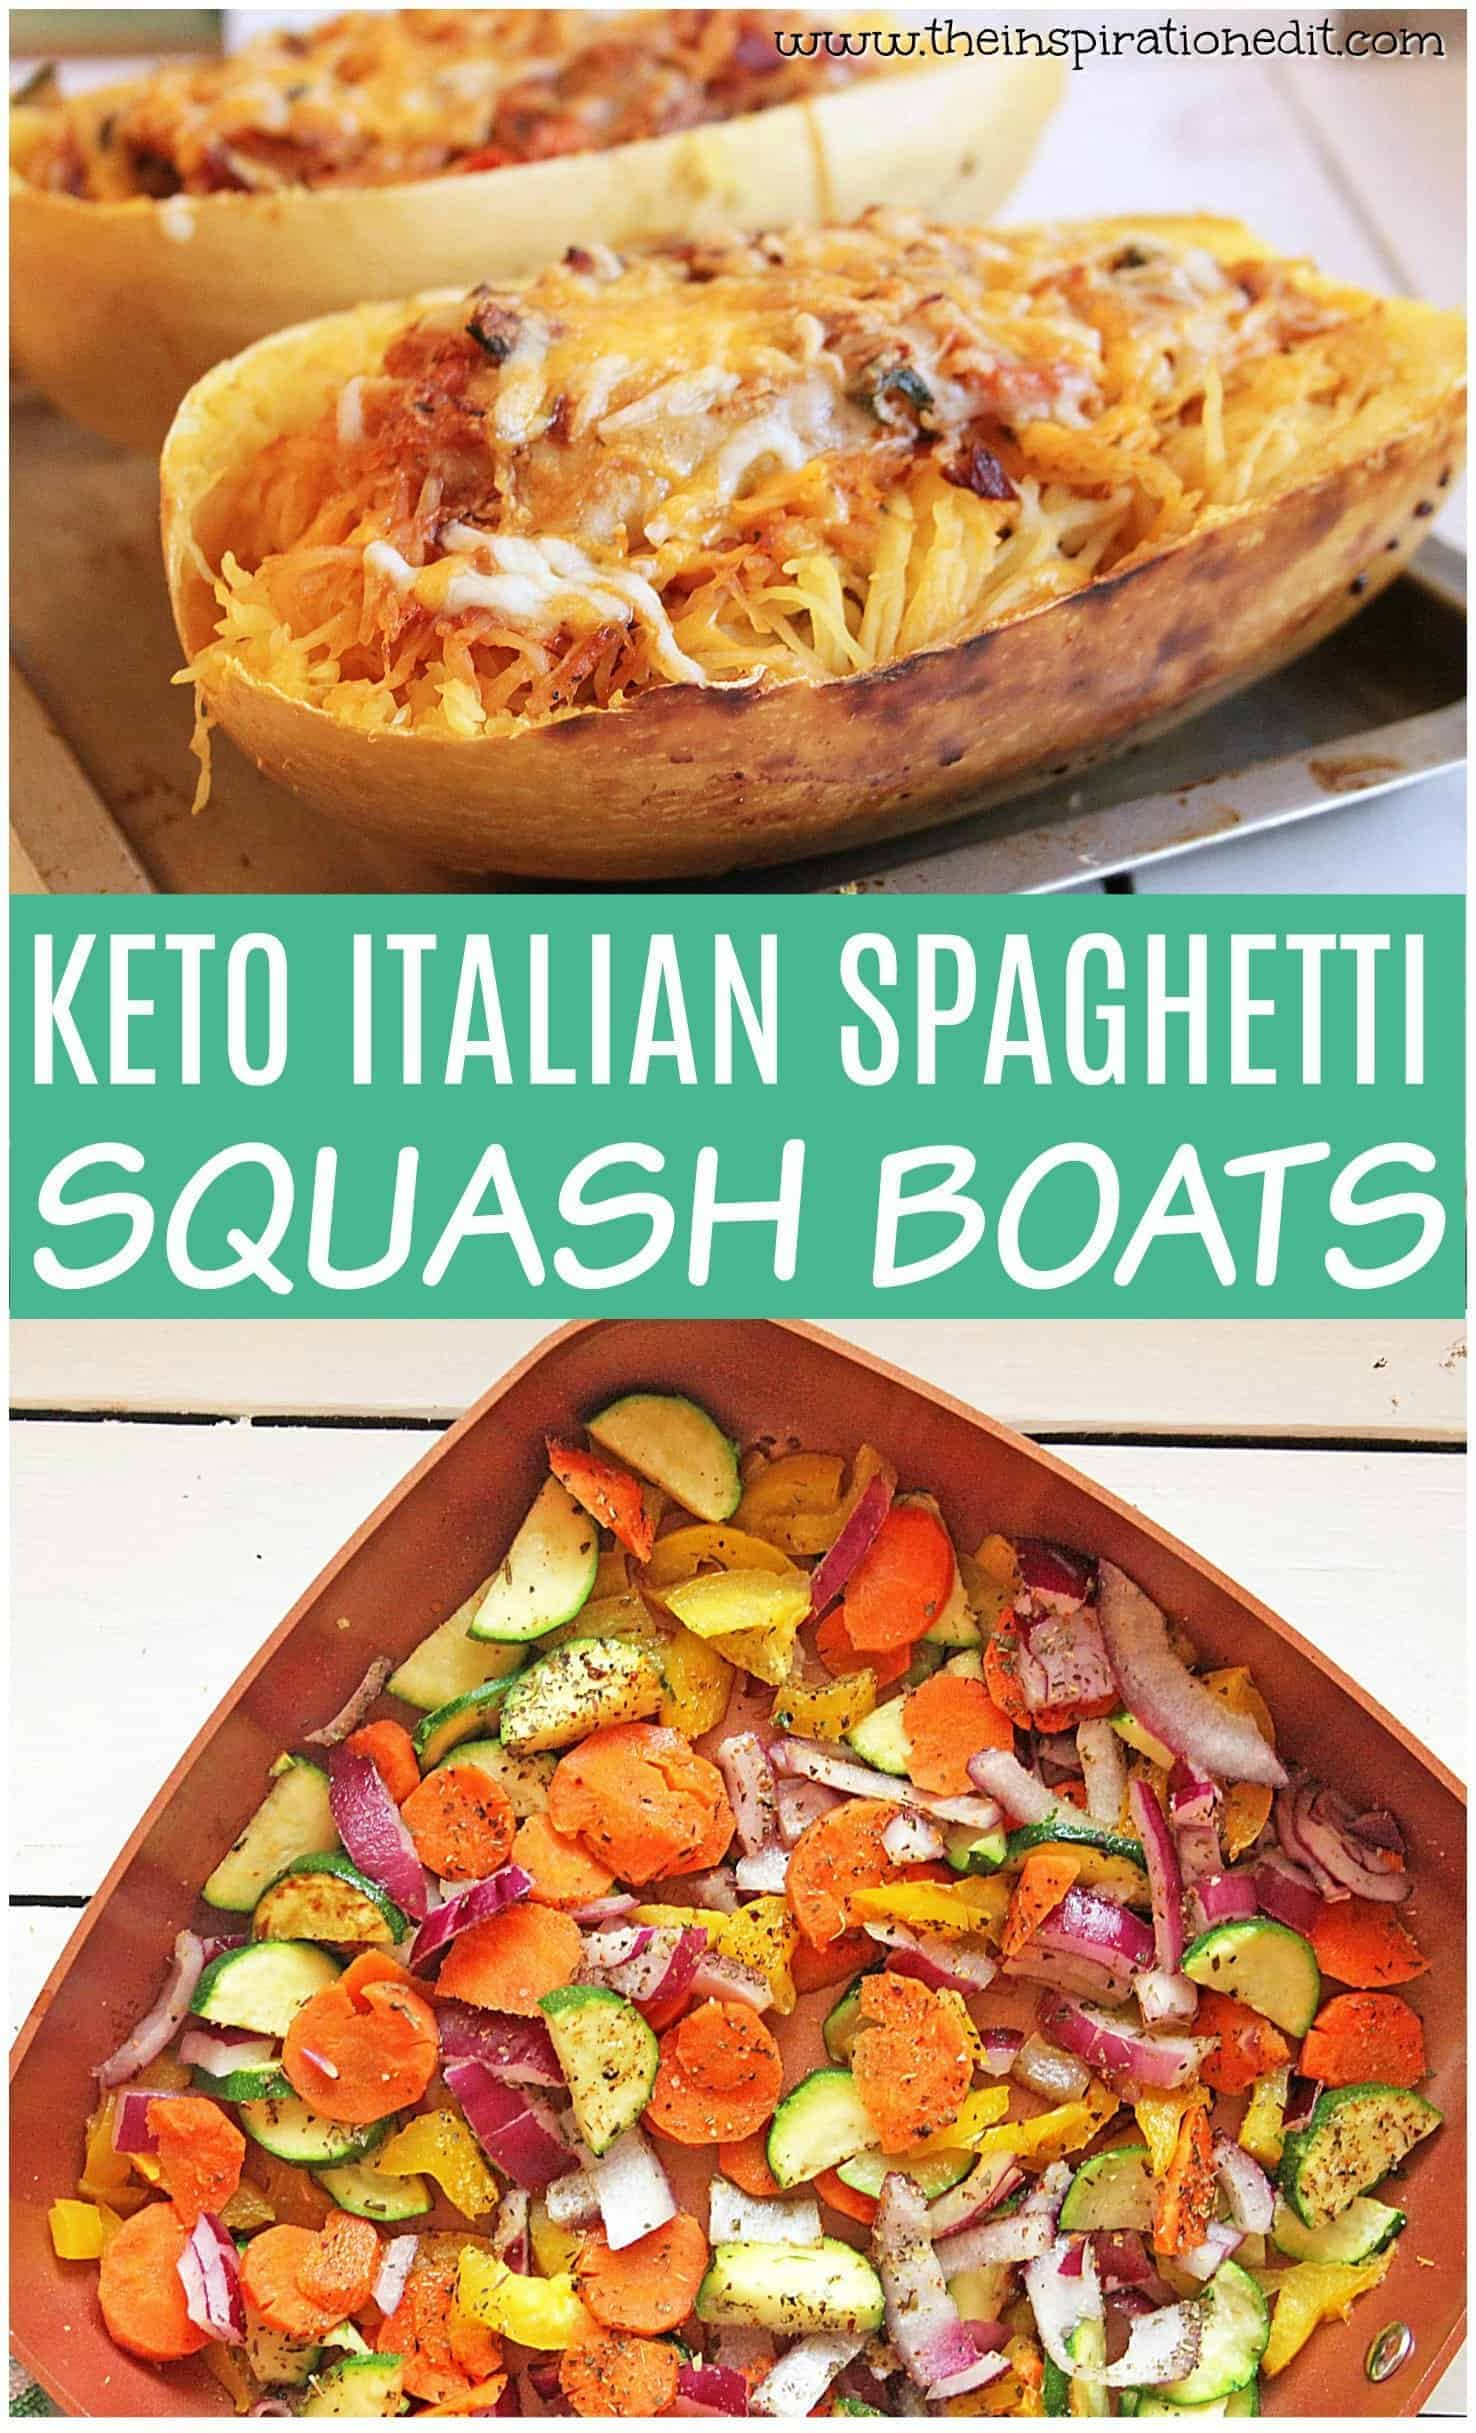 keto italian spaghetti squash boats(1)